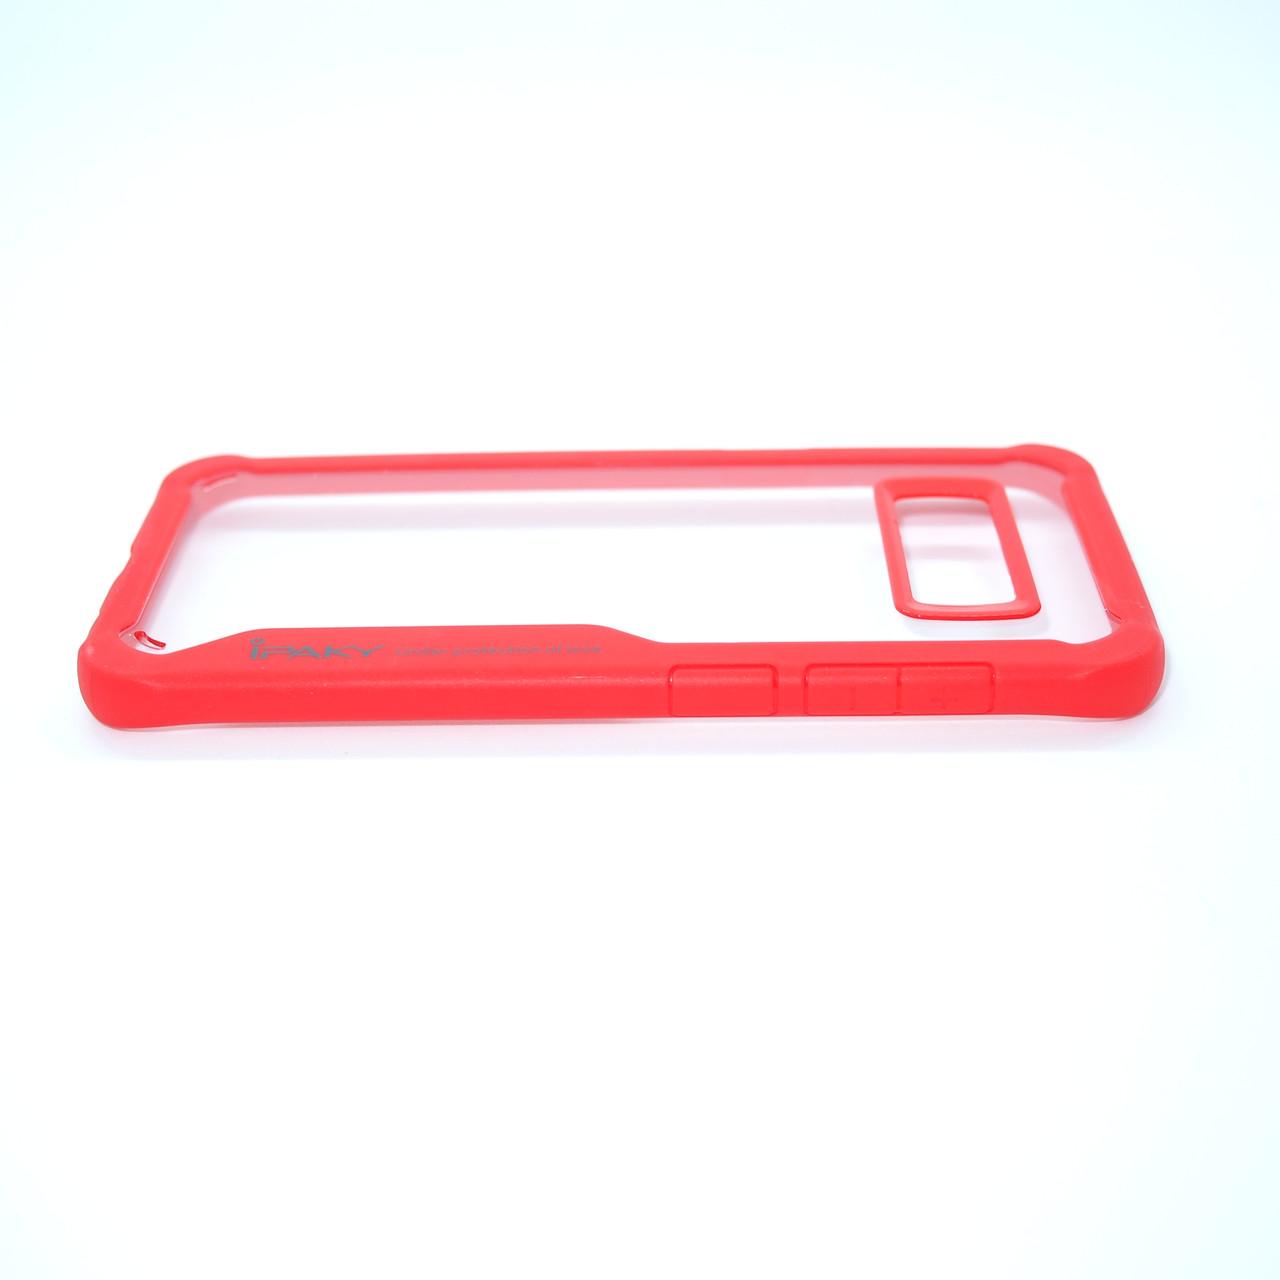 Чехлы для Samsung Galaxy S8 iPaky Survival G950 red